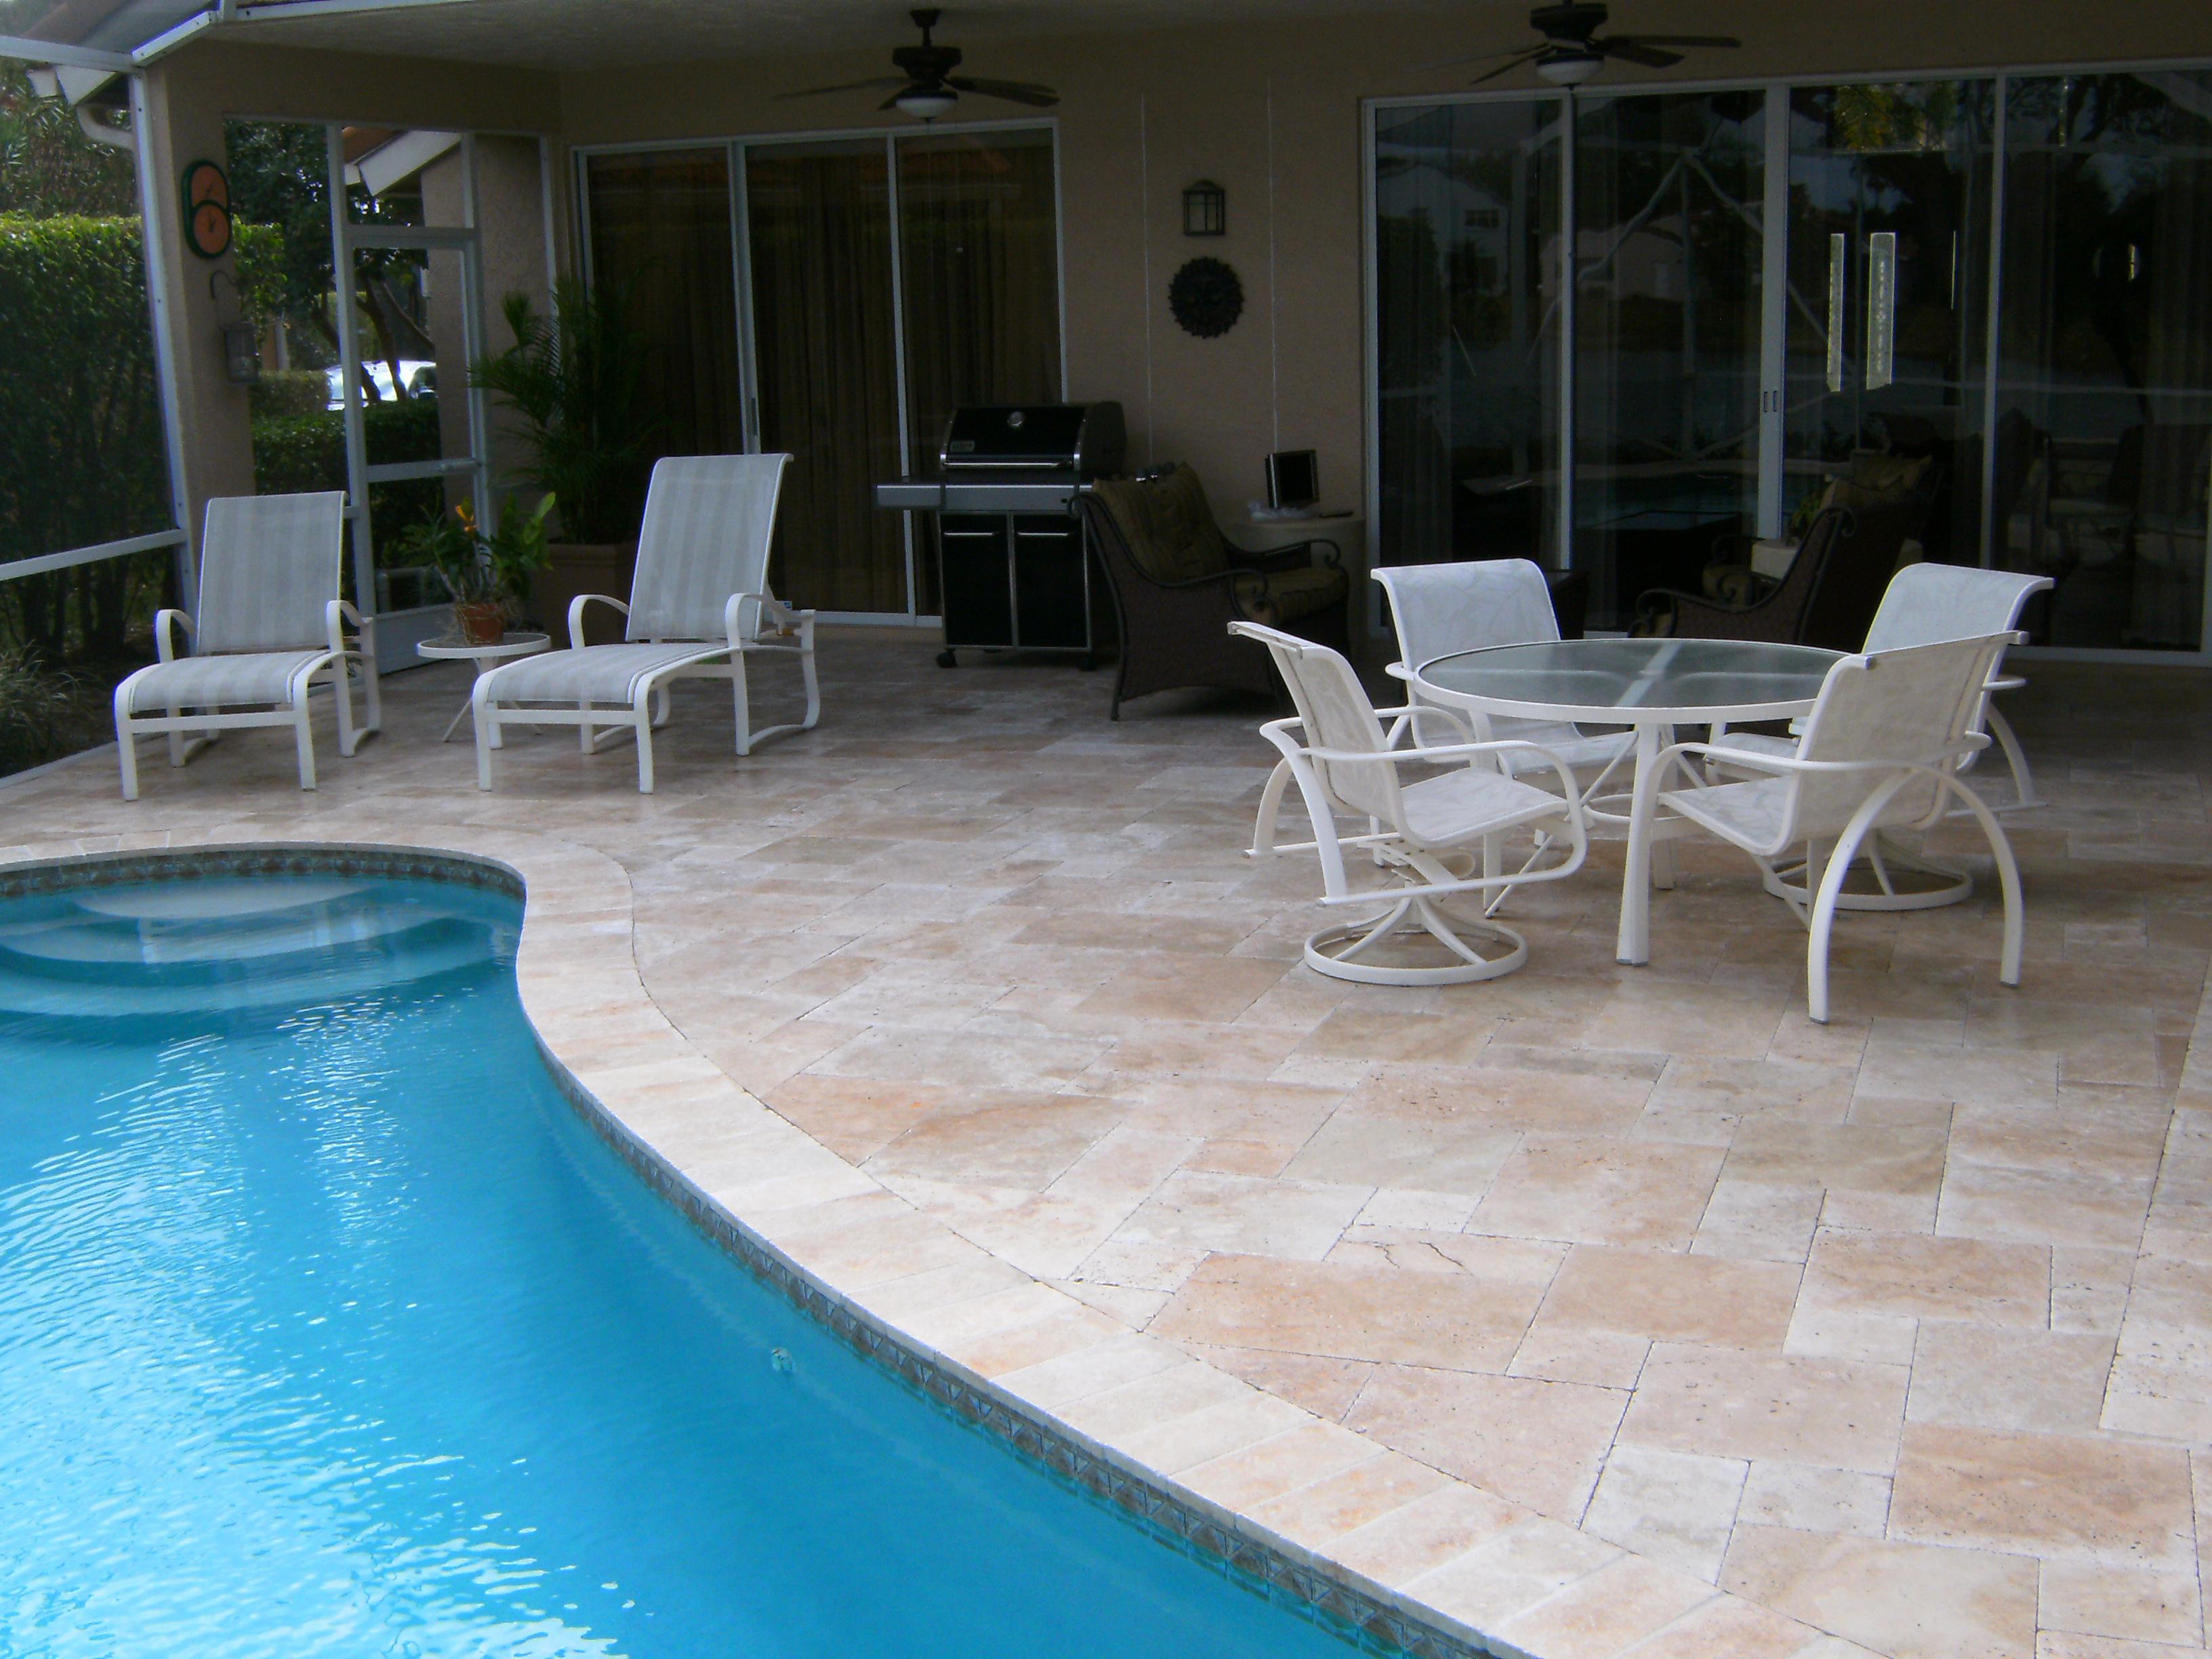 Travertine Tile Pool Travertine Instalation Photo Examples